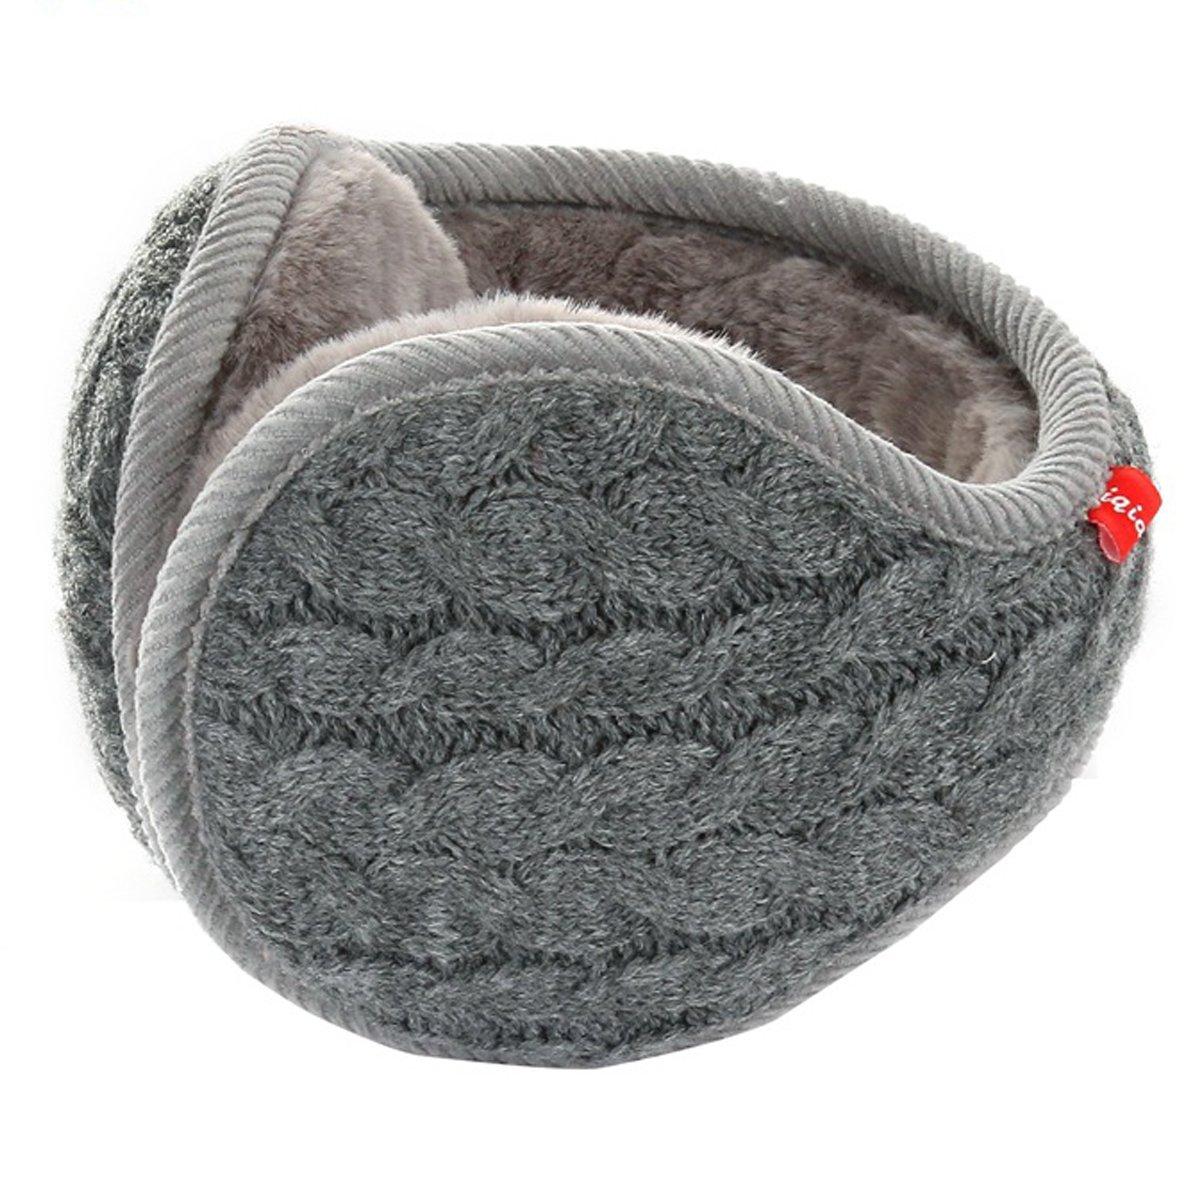 SamiTime Unisex Knit Cashmere Winter Outdoor Earmuffs with Fur Ear warmer, Adjustable Wrap,Pure Color EZ-001-Black